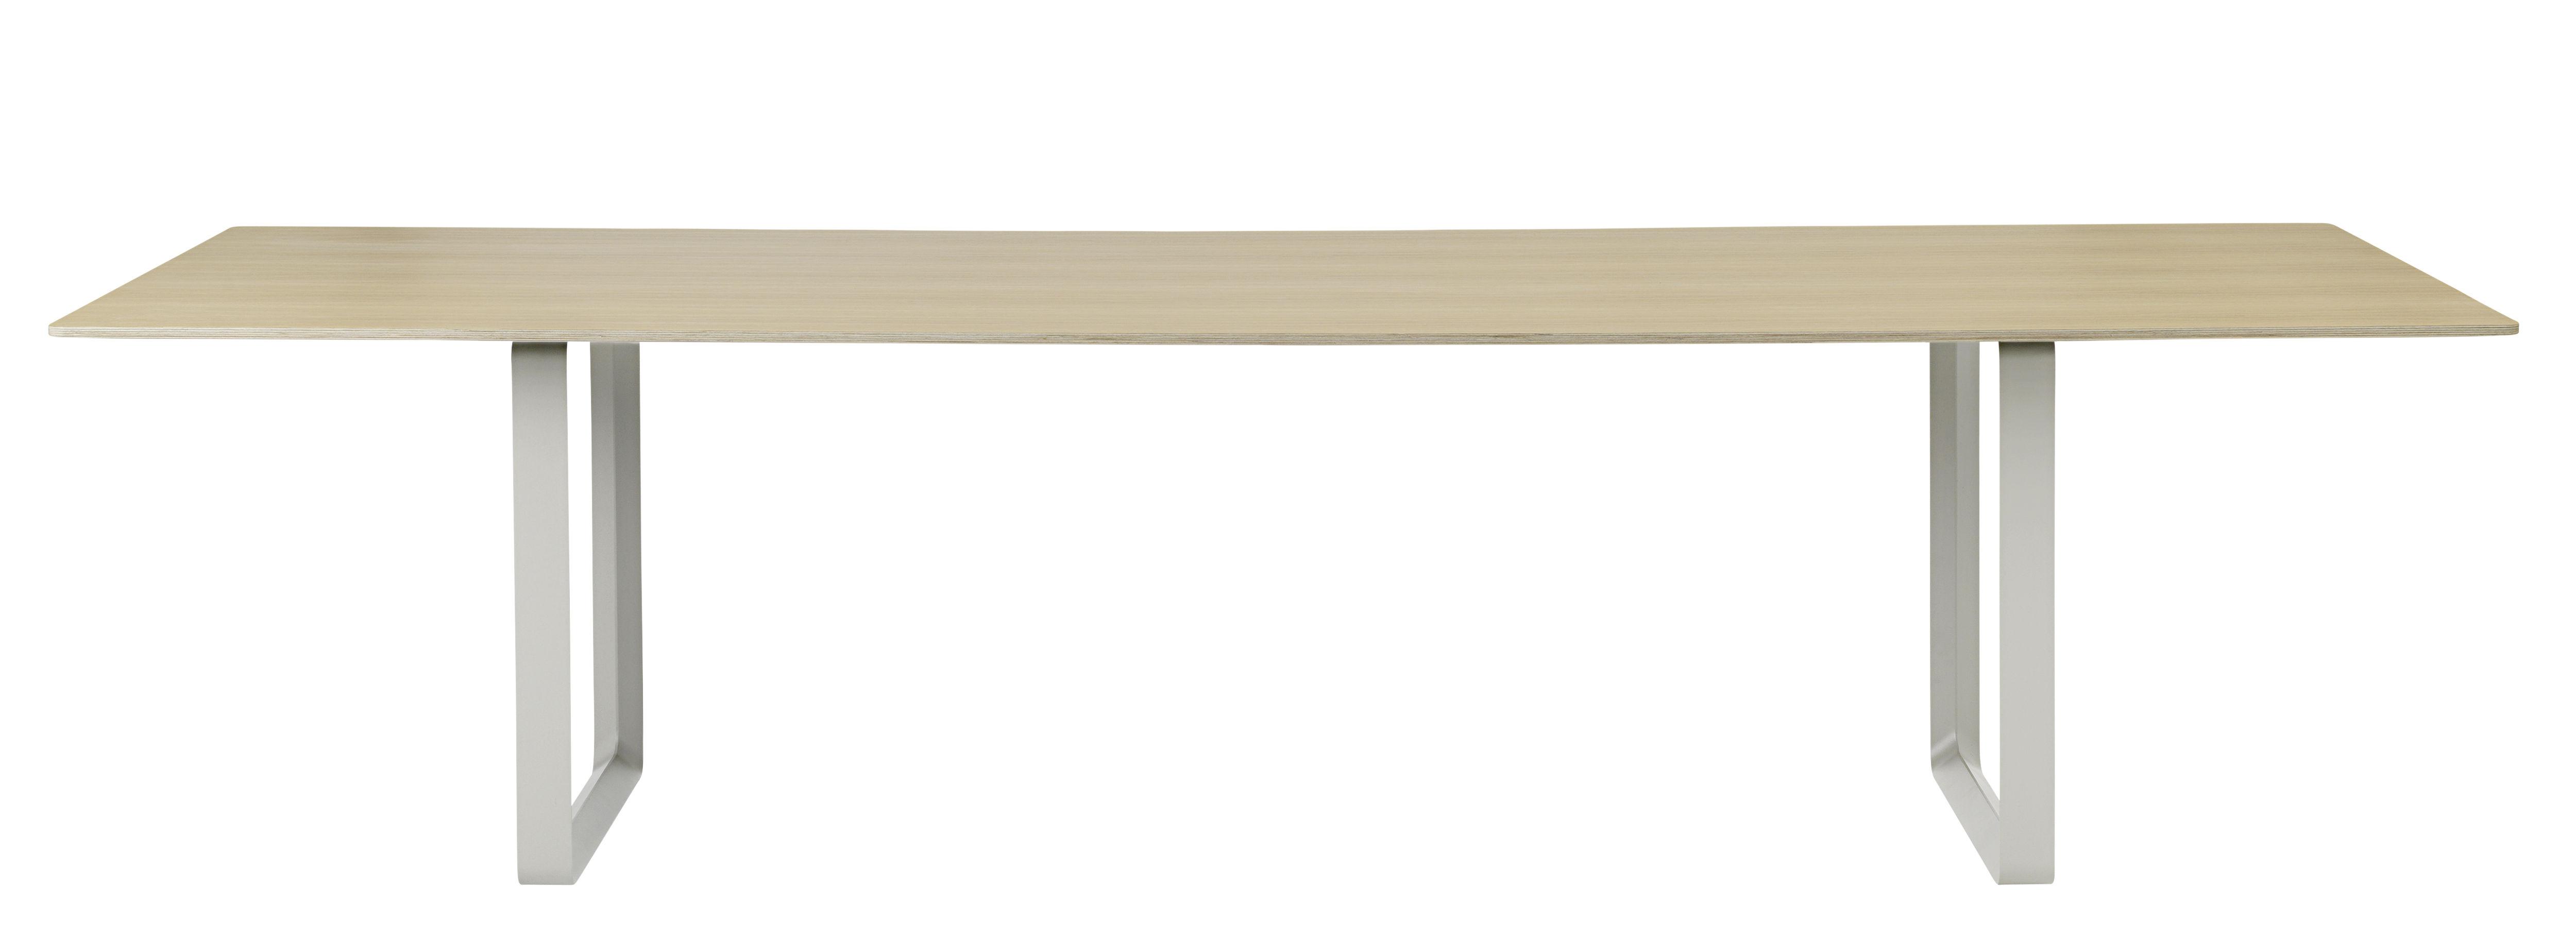 Mobilier - Tables - Table 70-70 XXL / 295 x 108 cm - Muuto - Chêne / Pieds gris - Aluminium, Chêne, Contreplaqué